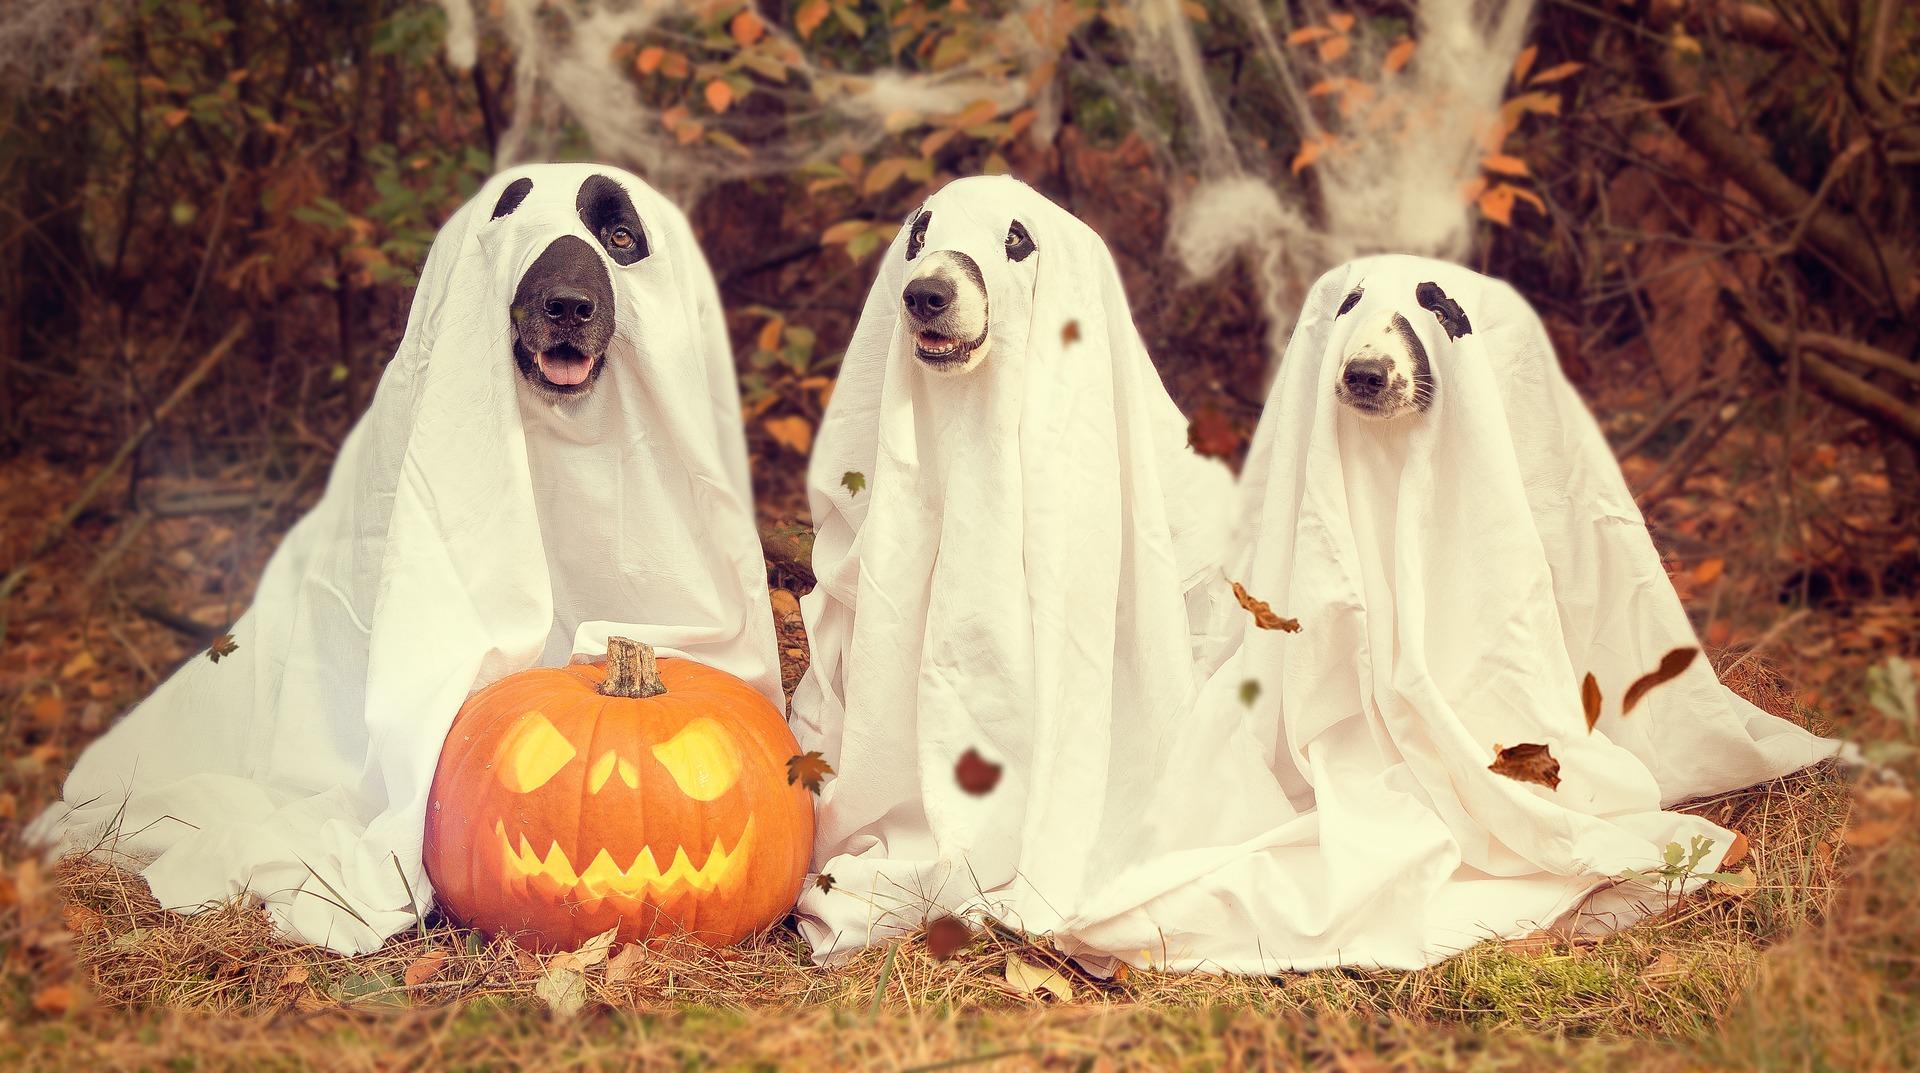 Halloween Dog Decoration Ideas 2021 Uptodatedaily